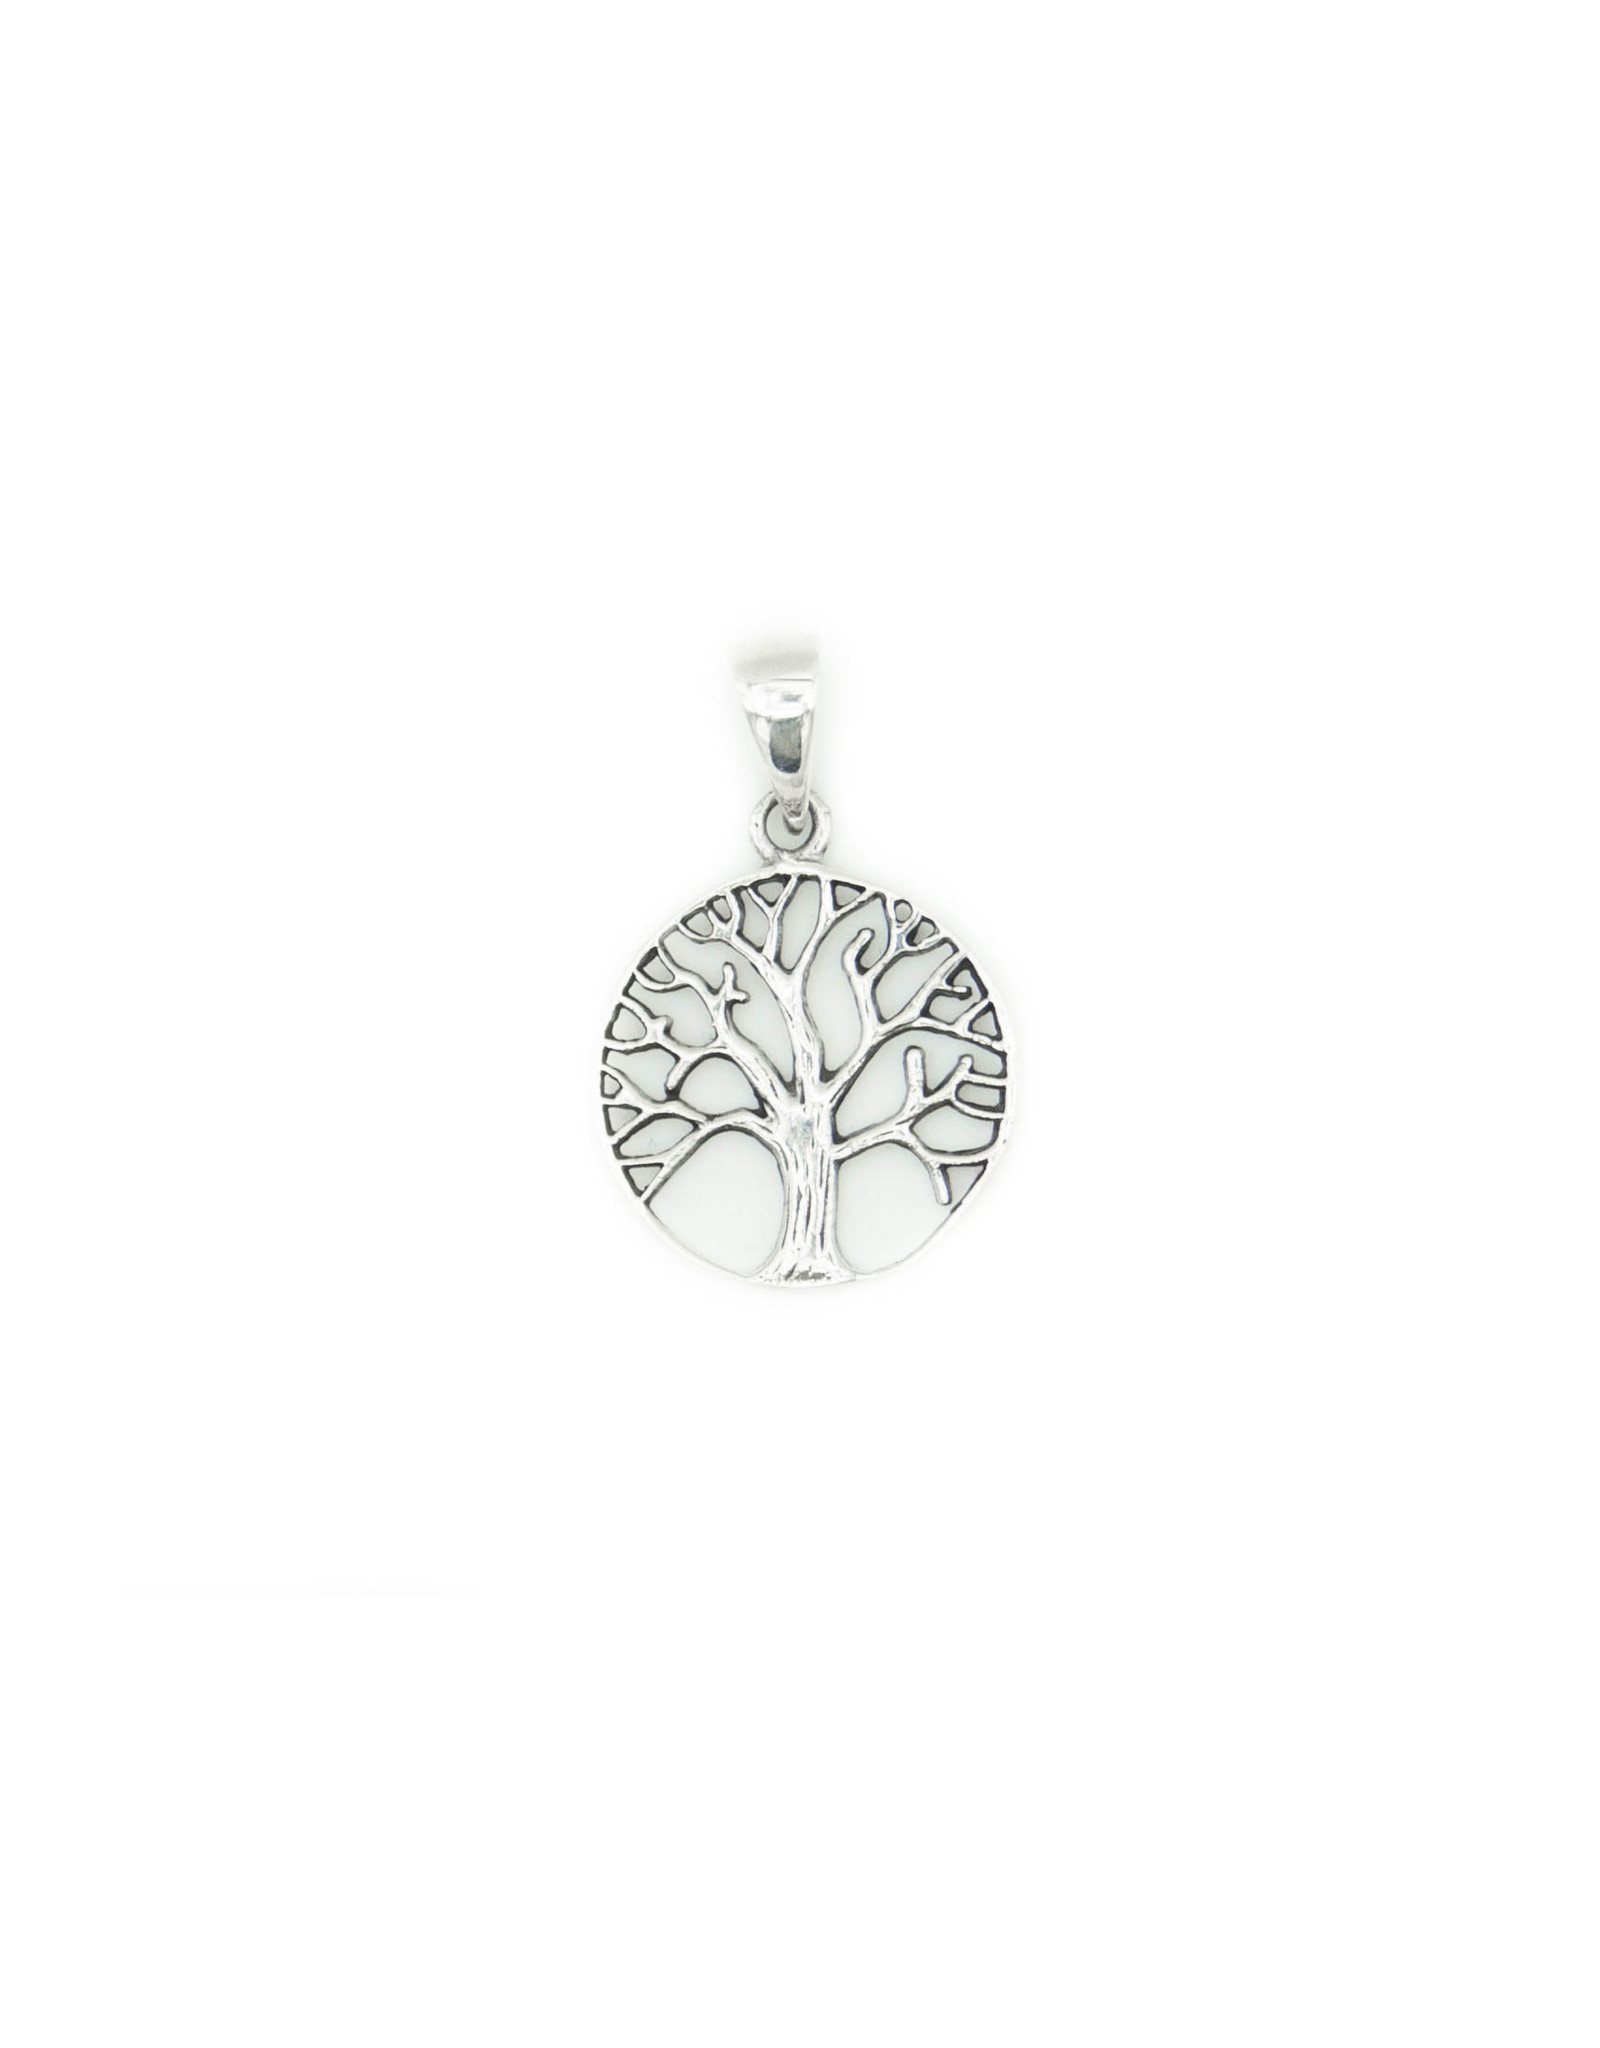 Silver Pendant - Tree of life